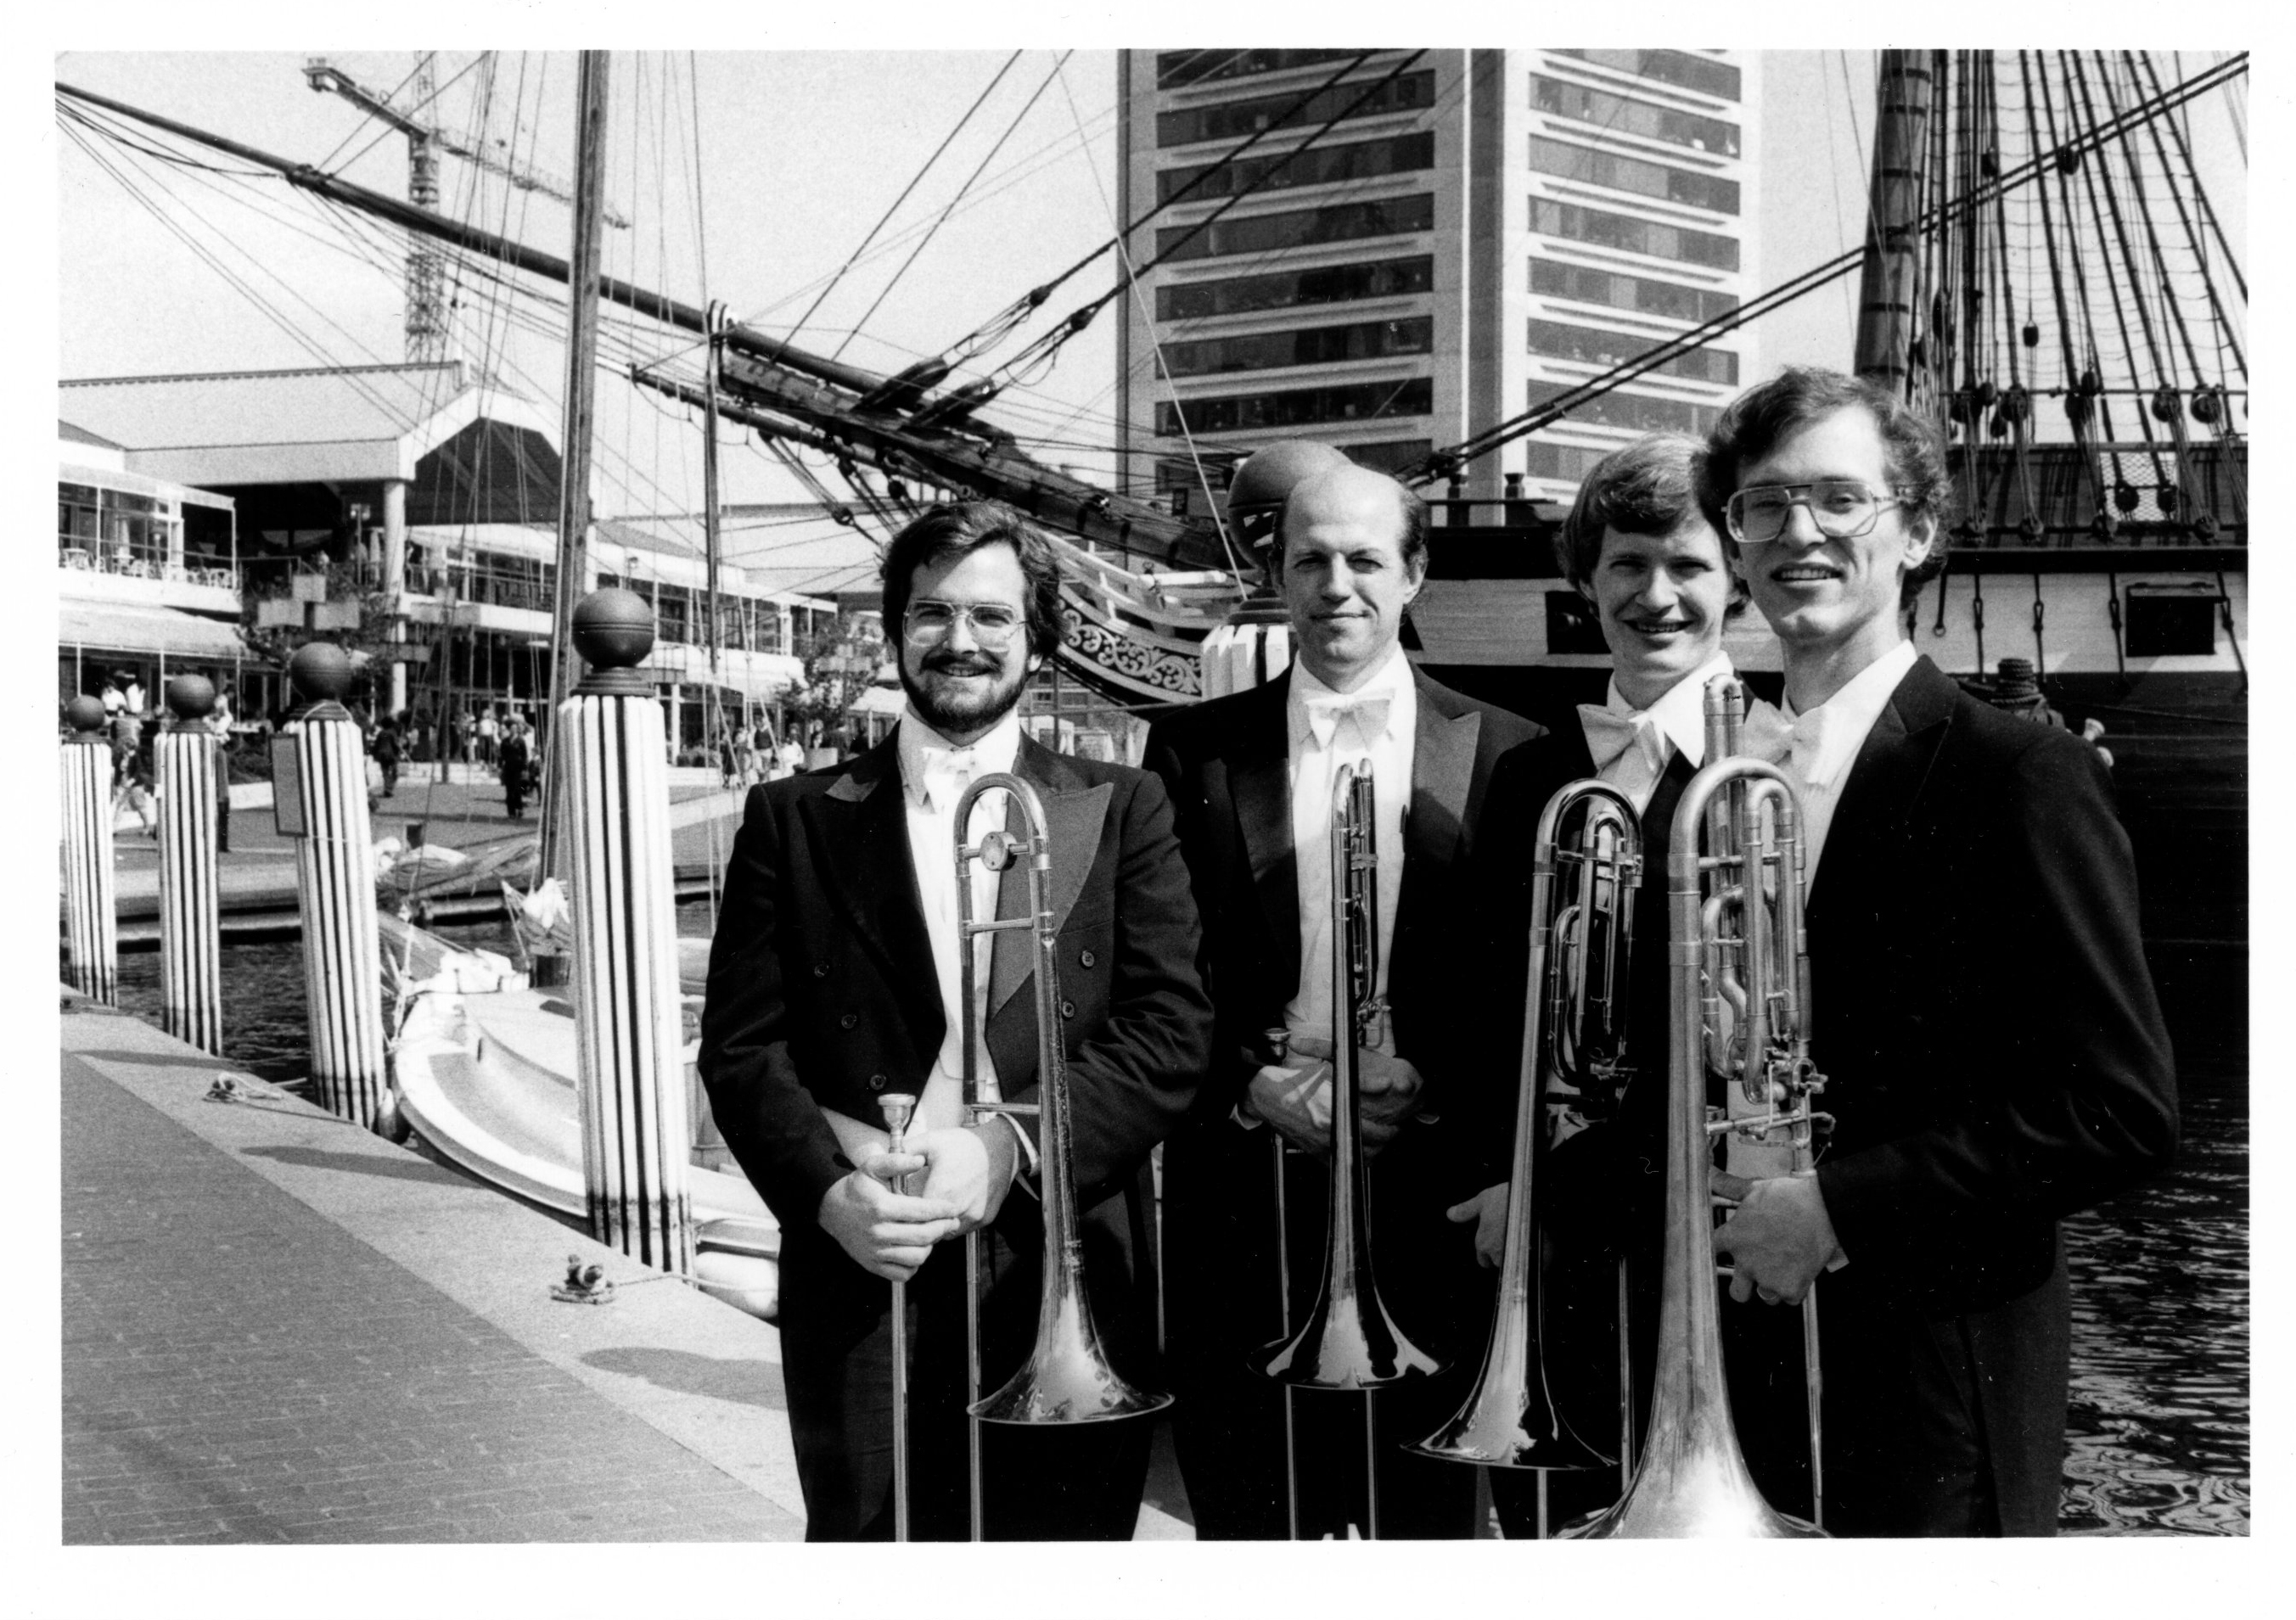 Balto_Sym_trombones_summer_1981